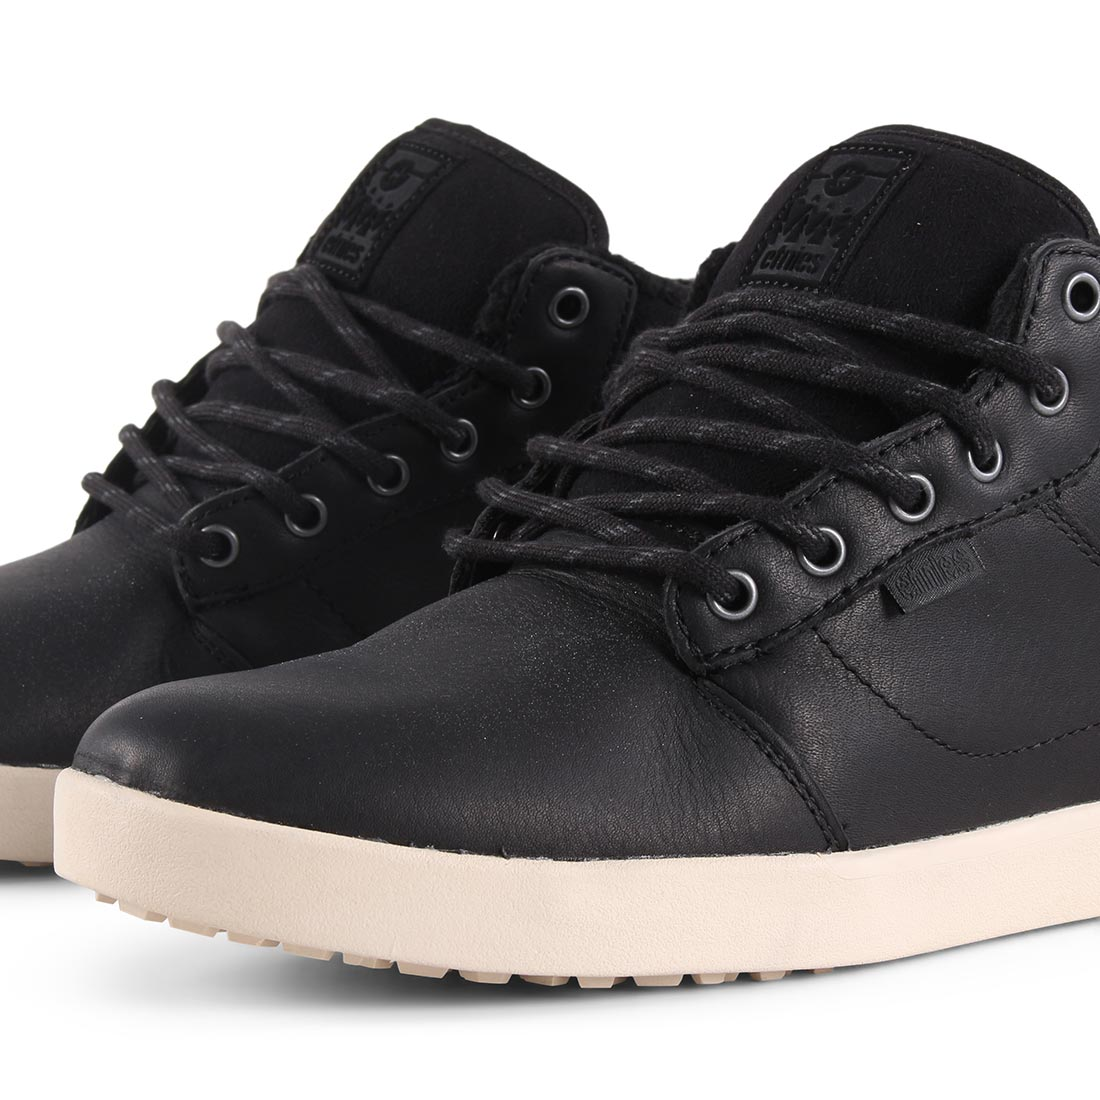 Shoes Etnies Jefferson Black Mtw Brown tQrBodsxhC